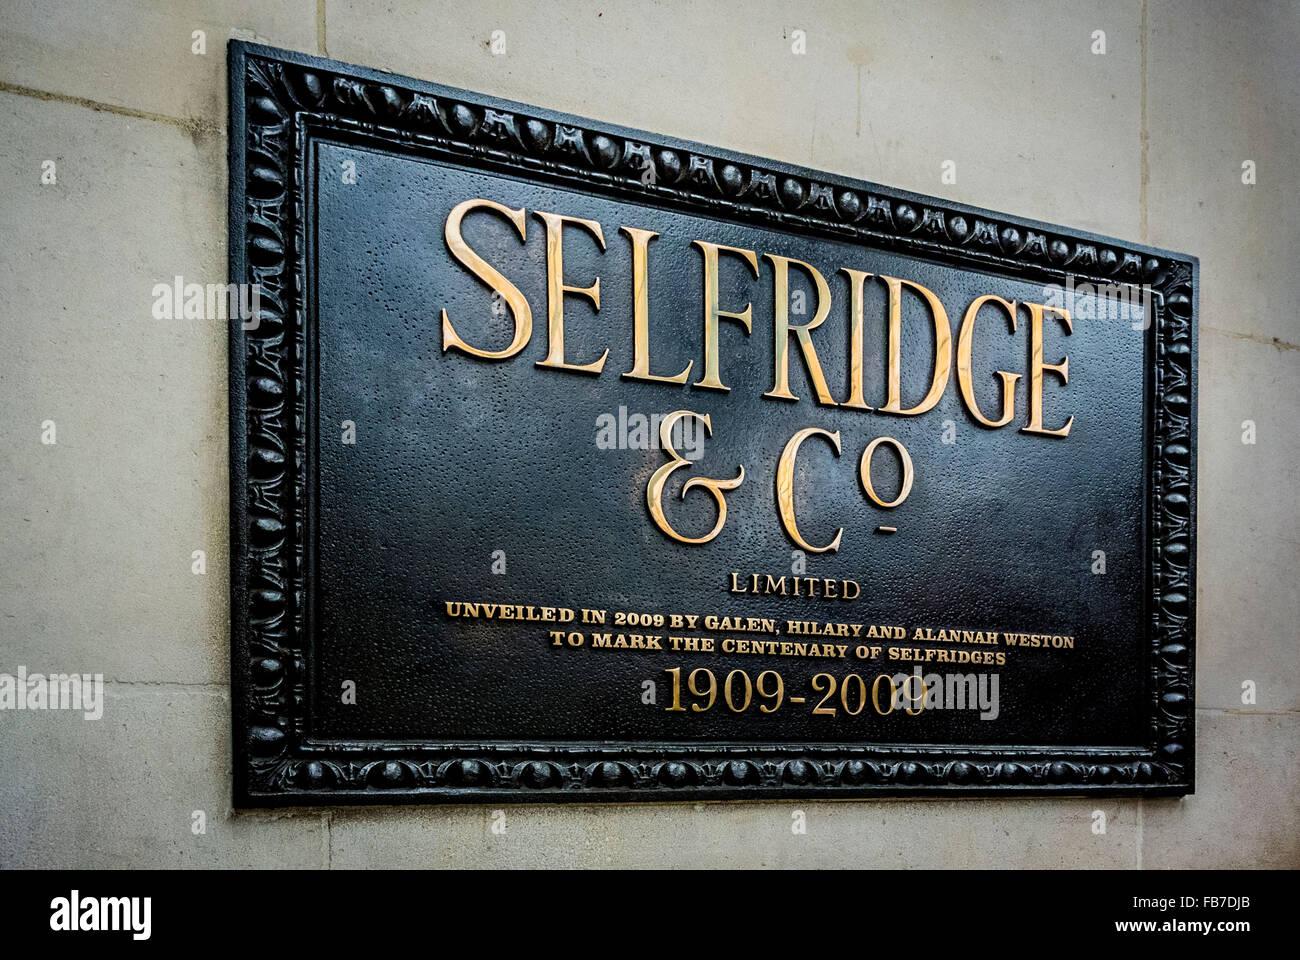 Selfridge & Co sign outside Selfridges Department Store, Oxford Street, London, UK. - Stock Image